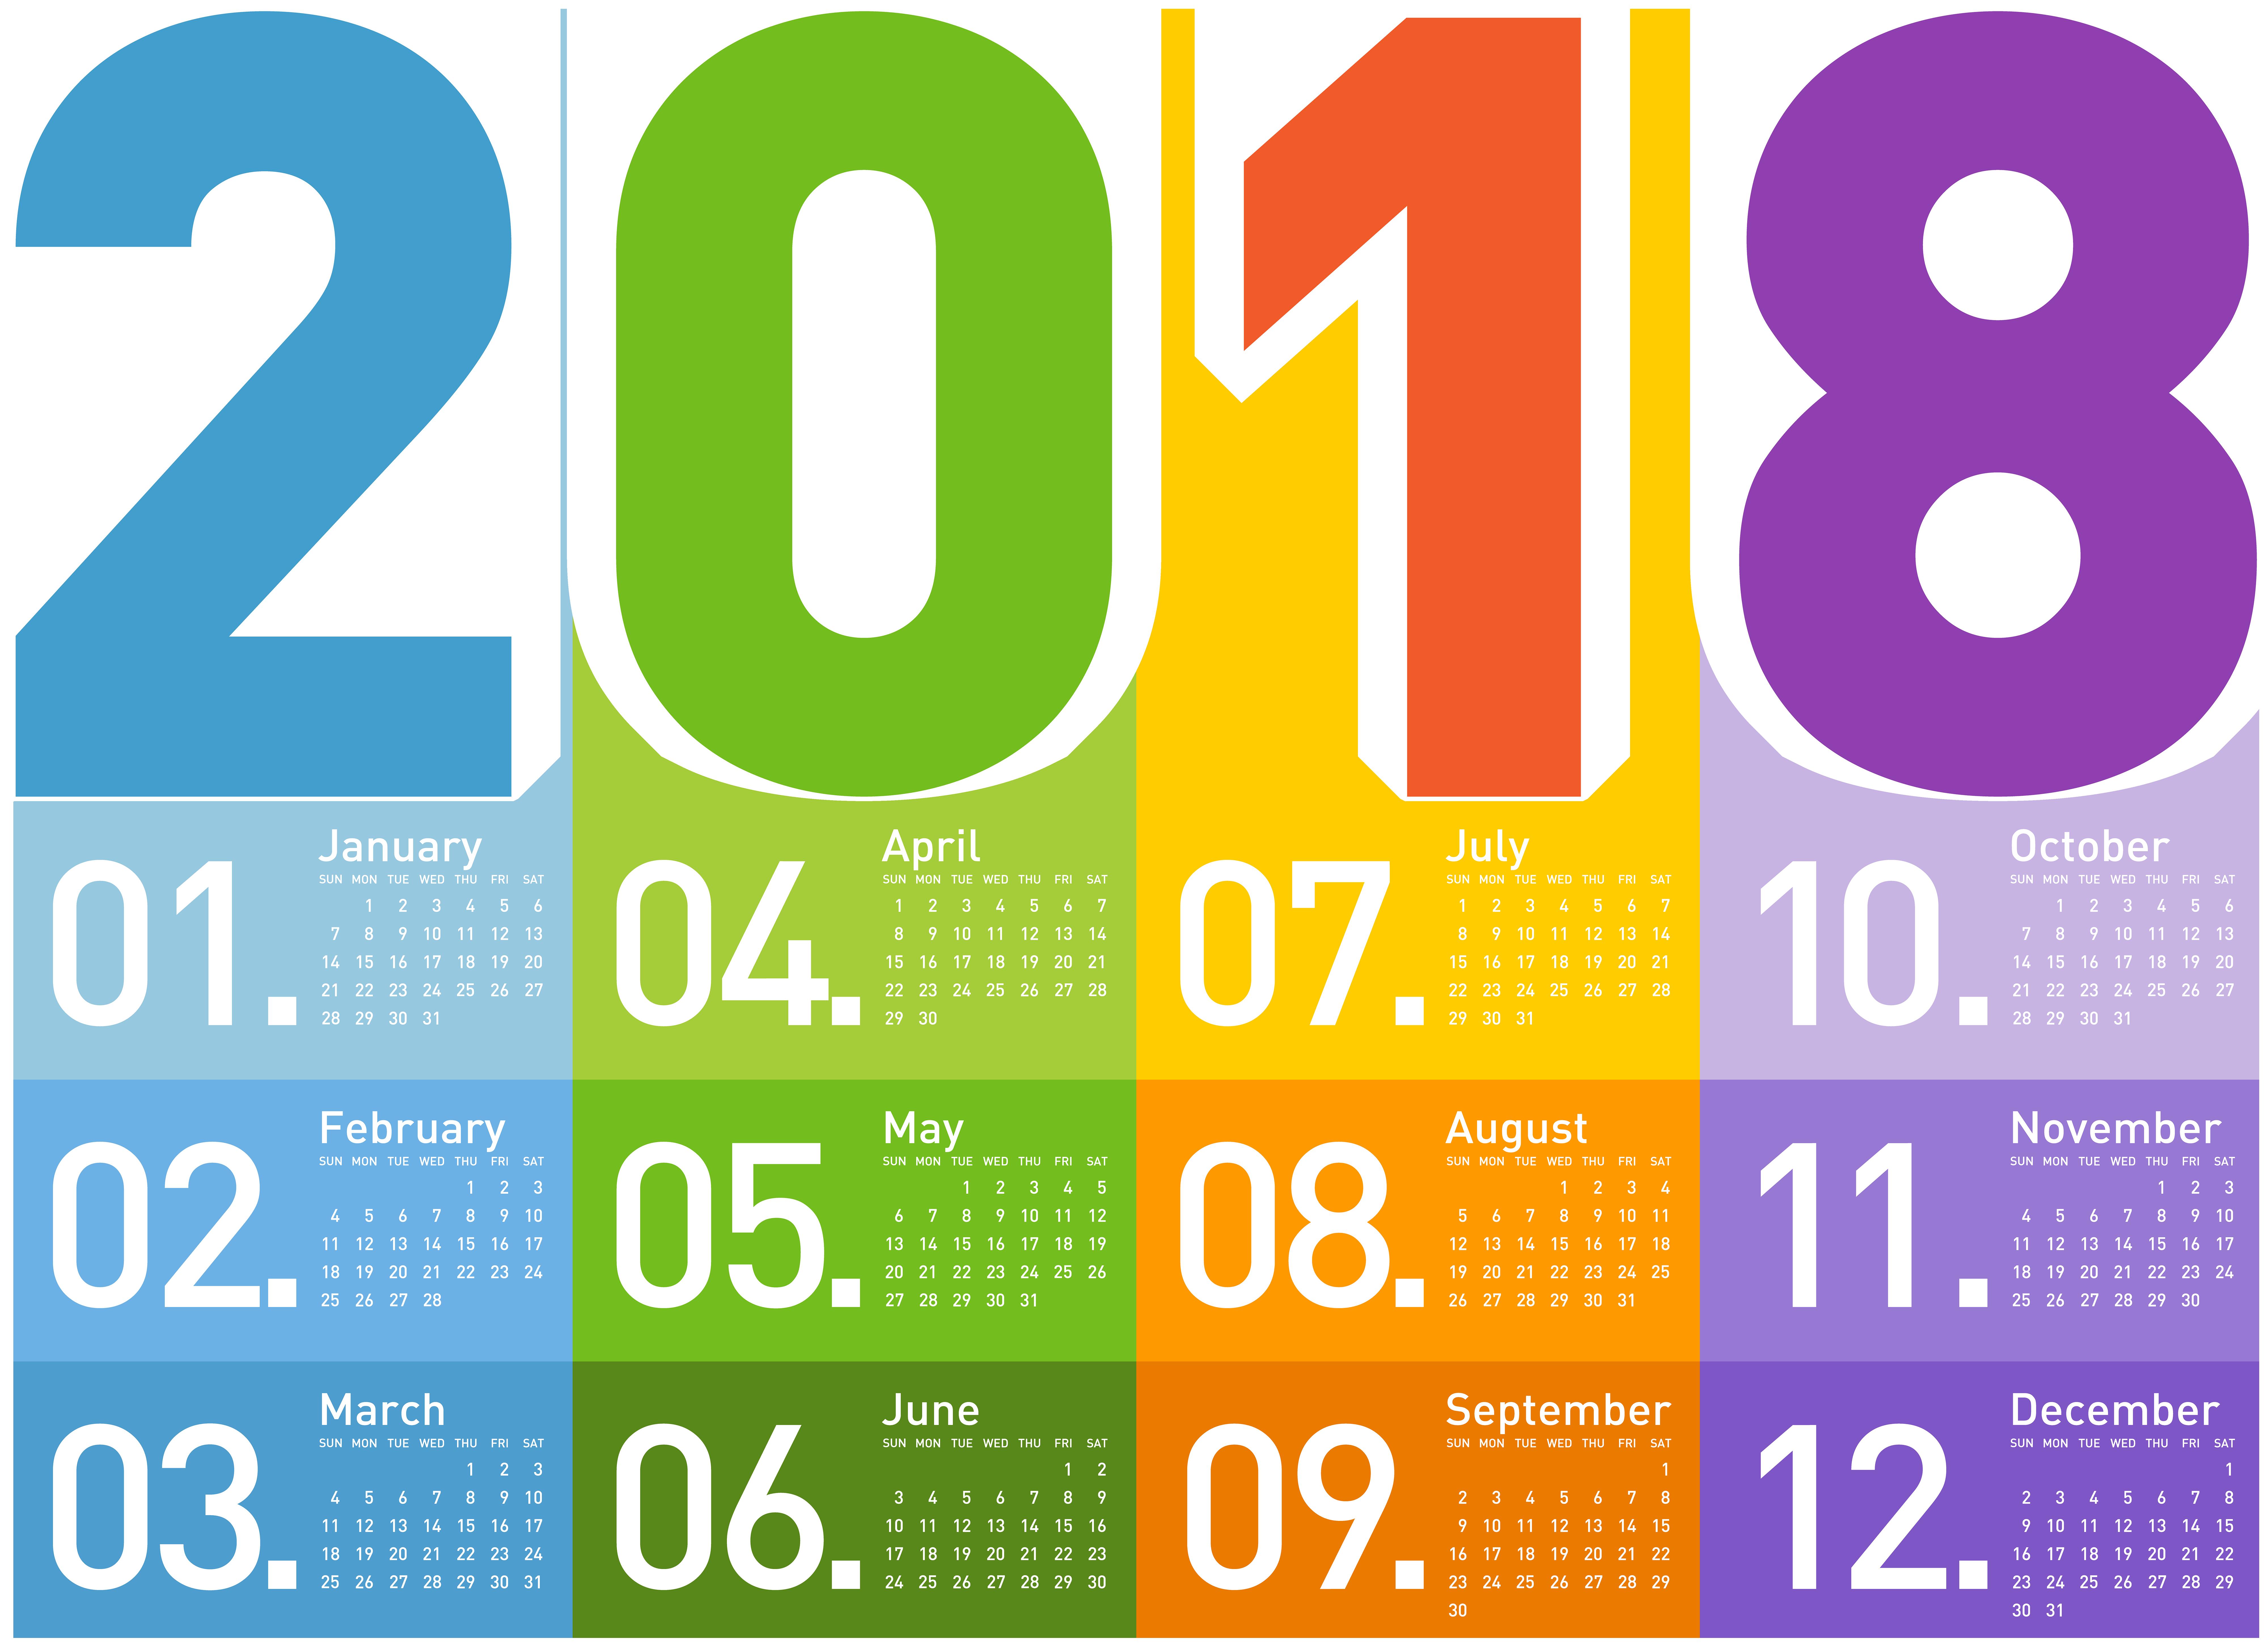 transparent calendar png. Schedule clipart free clipart